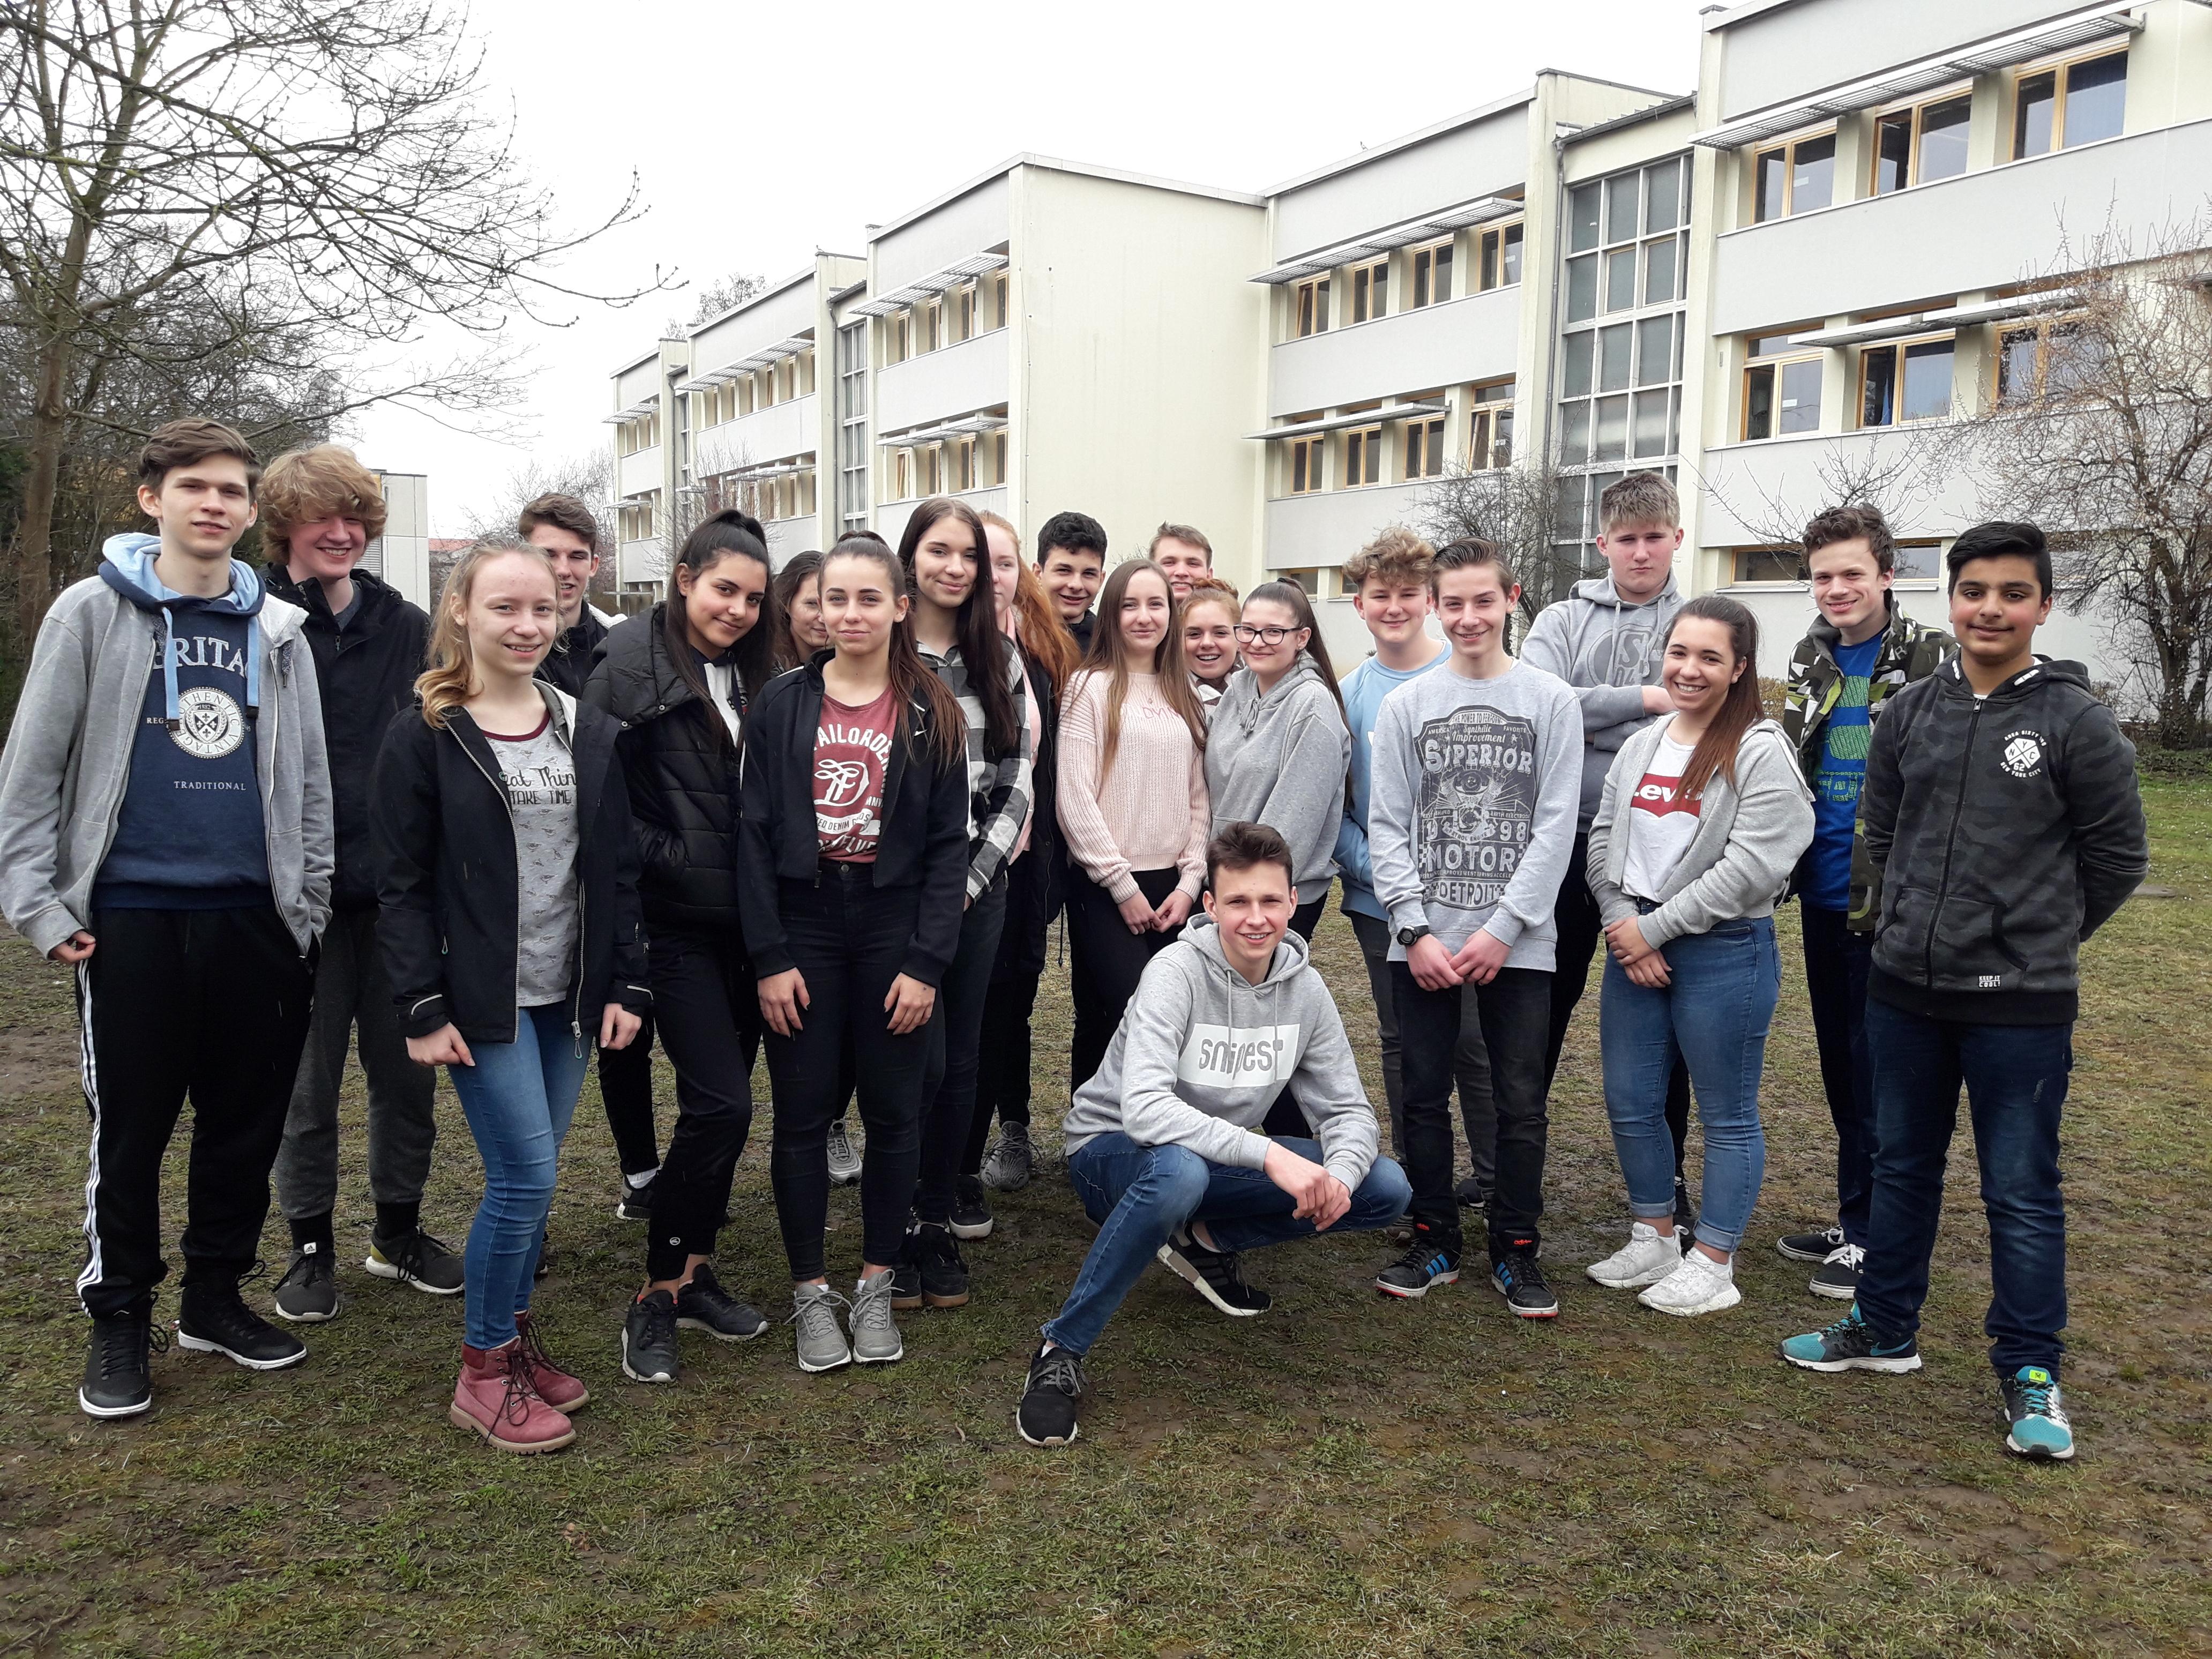 Martin-Niemöller-Schule